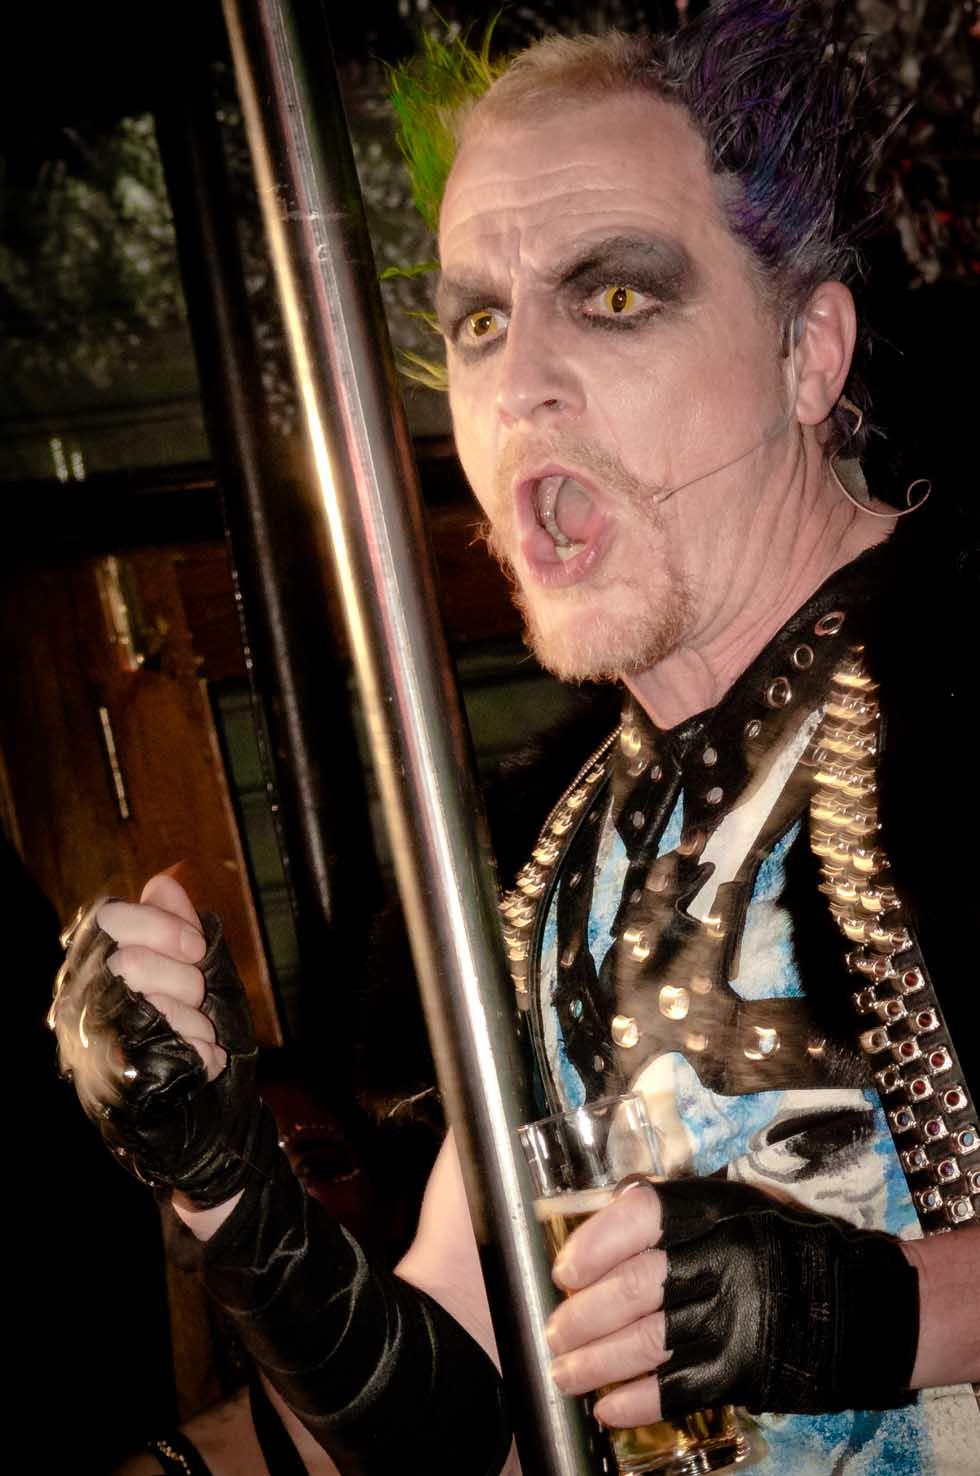 zum-schneider-nyc-2012-karneval-apocalyptika-4134.jpg